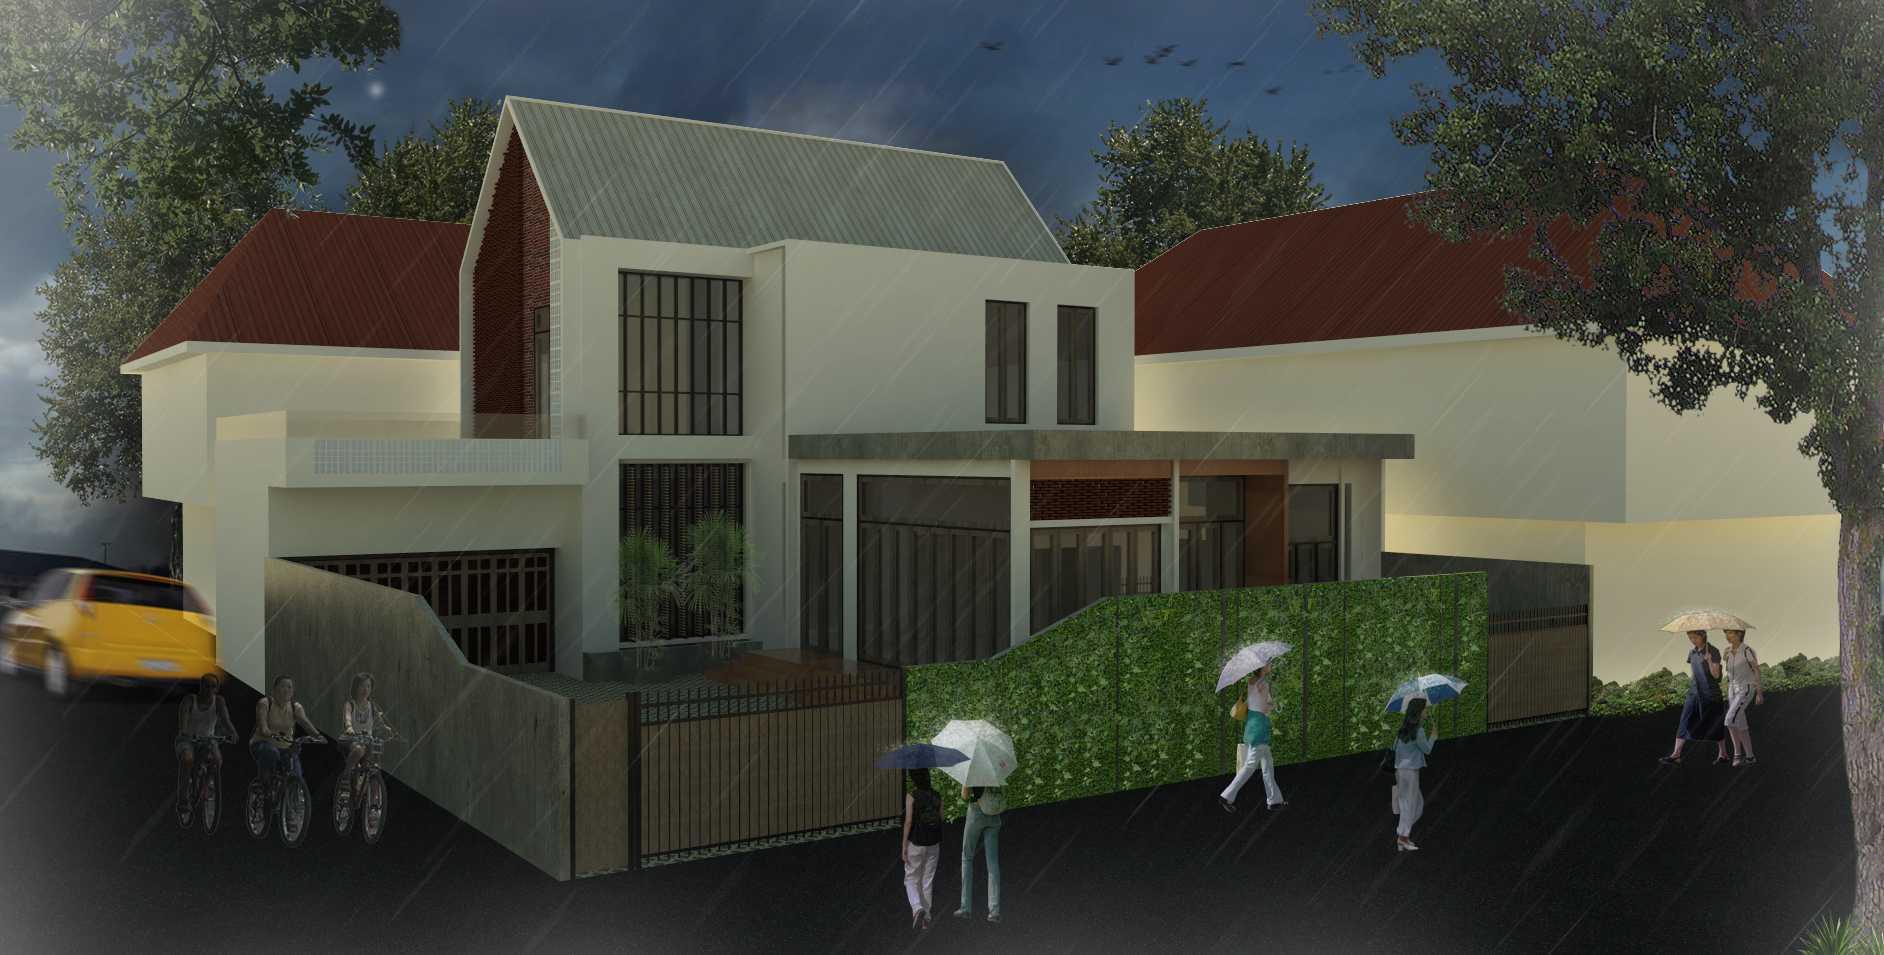 Ateliernusantara Rumah Poligon Palembang, Kota Palembang, Sumatera Selatan, Indonesia  Exterior View   42792